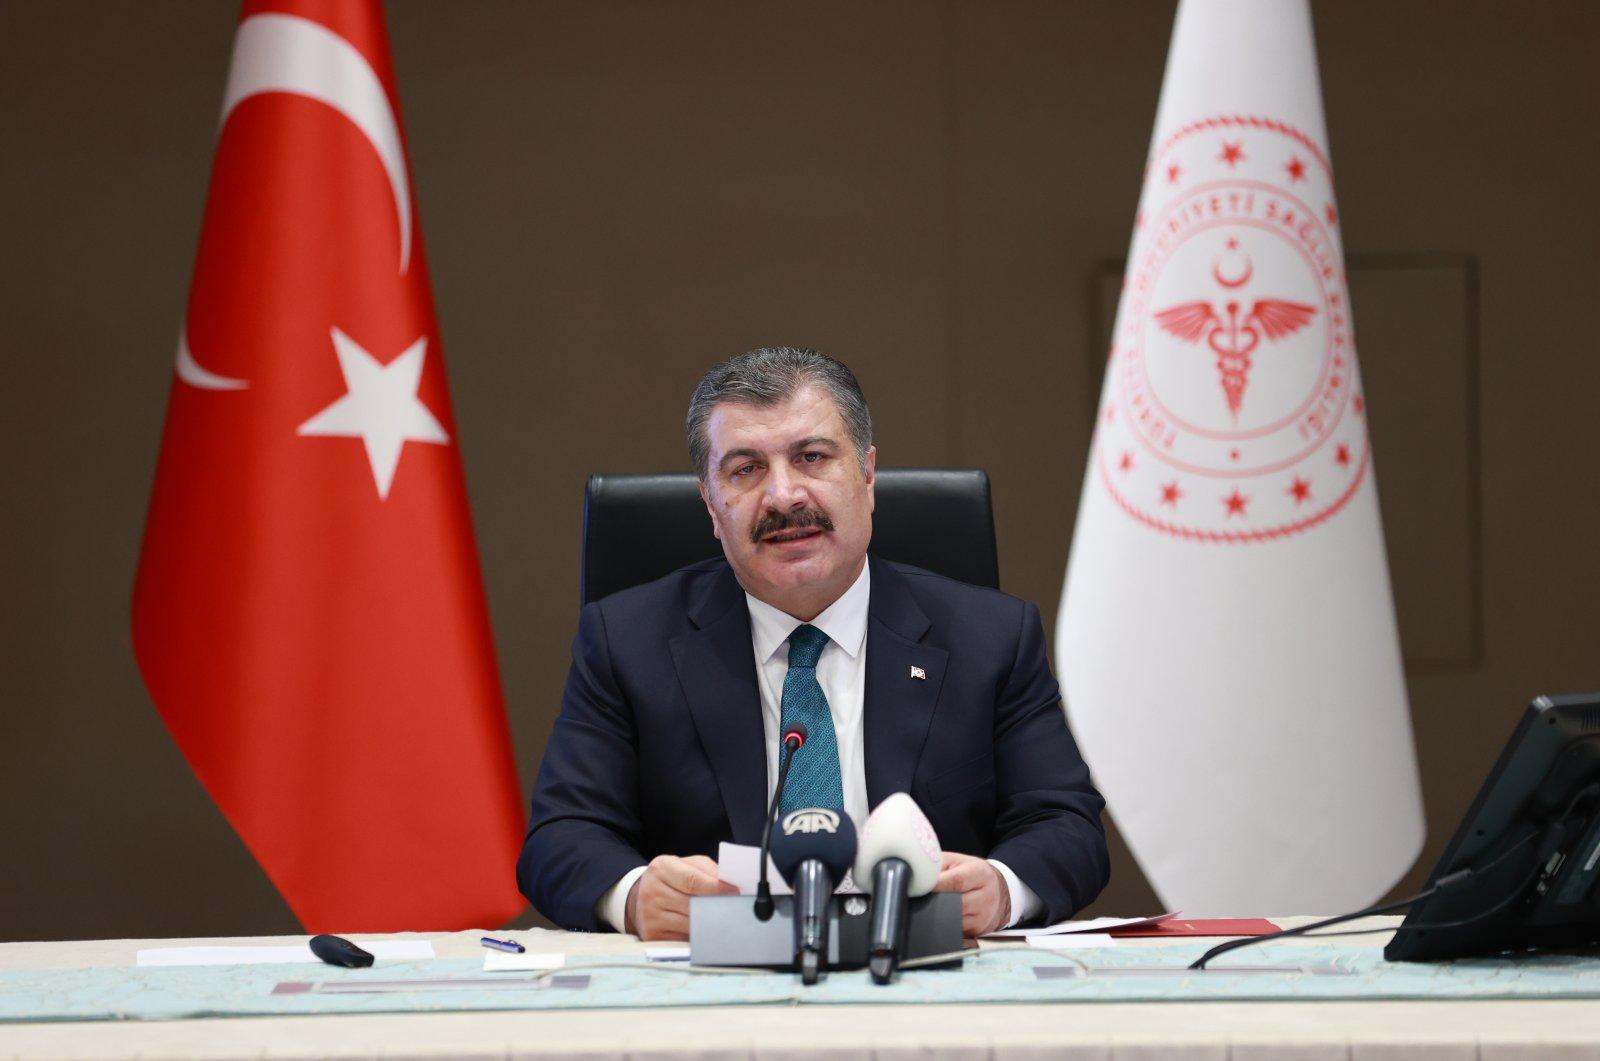 Health Minister Fahrettin Koca speaks during a press conference after a Coronavirus Scientific Advisory Board meeting in Ankara, Turkey, June 23, 2021. (AA Photo)